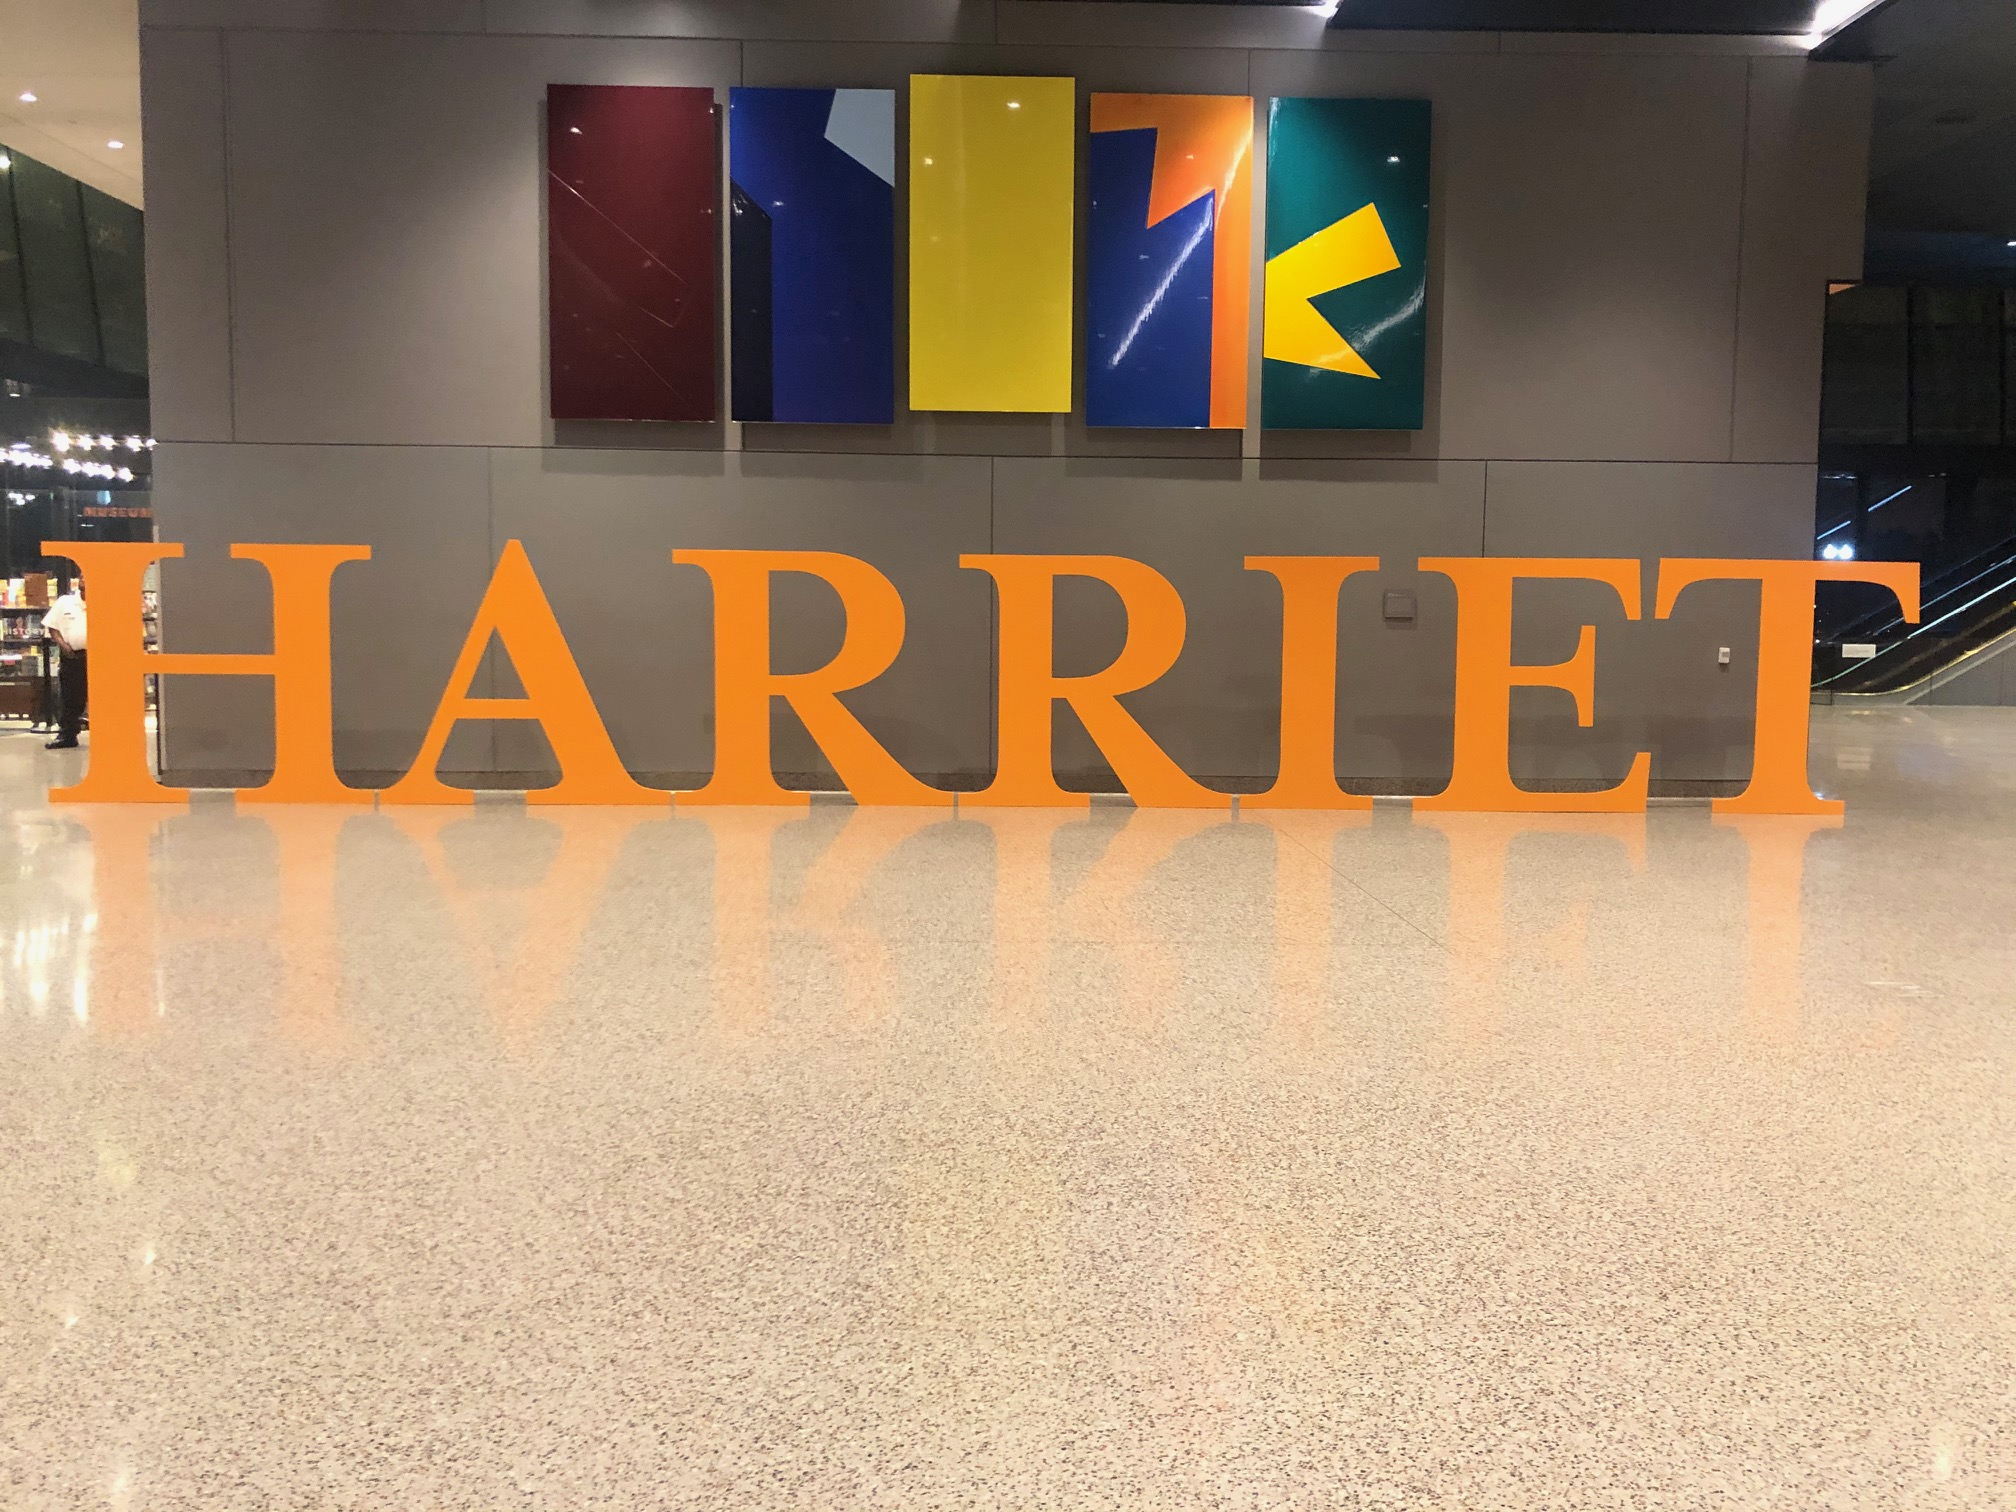 Harriet-Premiere-The-Church-Lady-Blogs